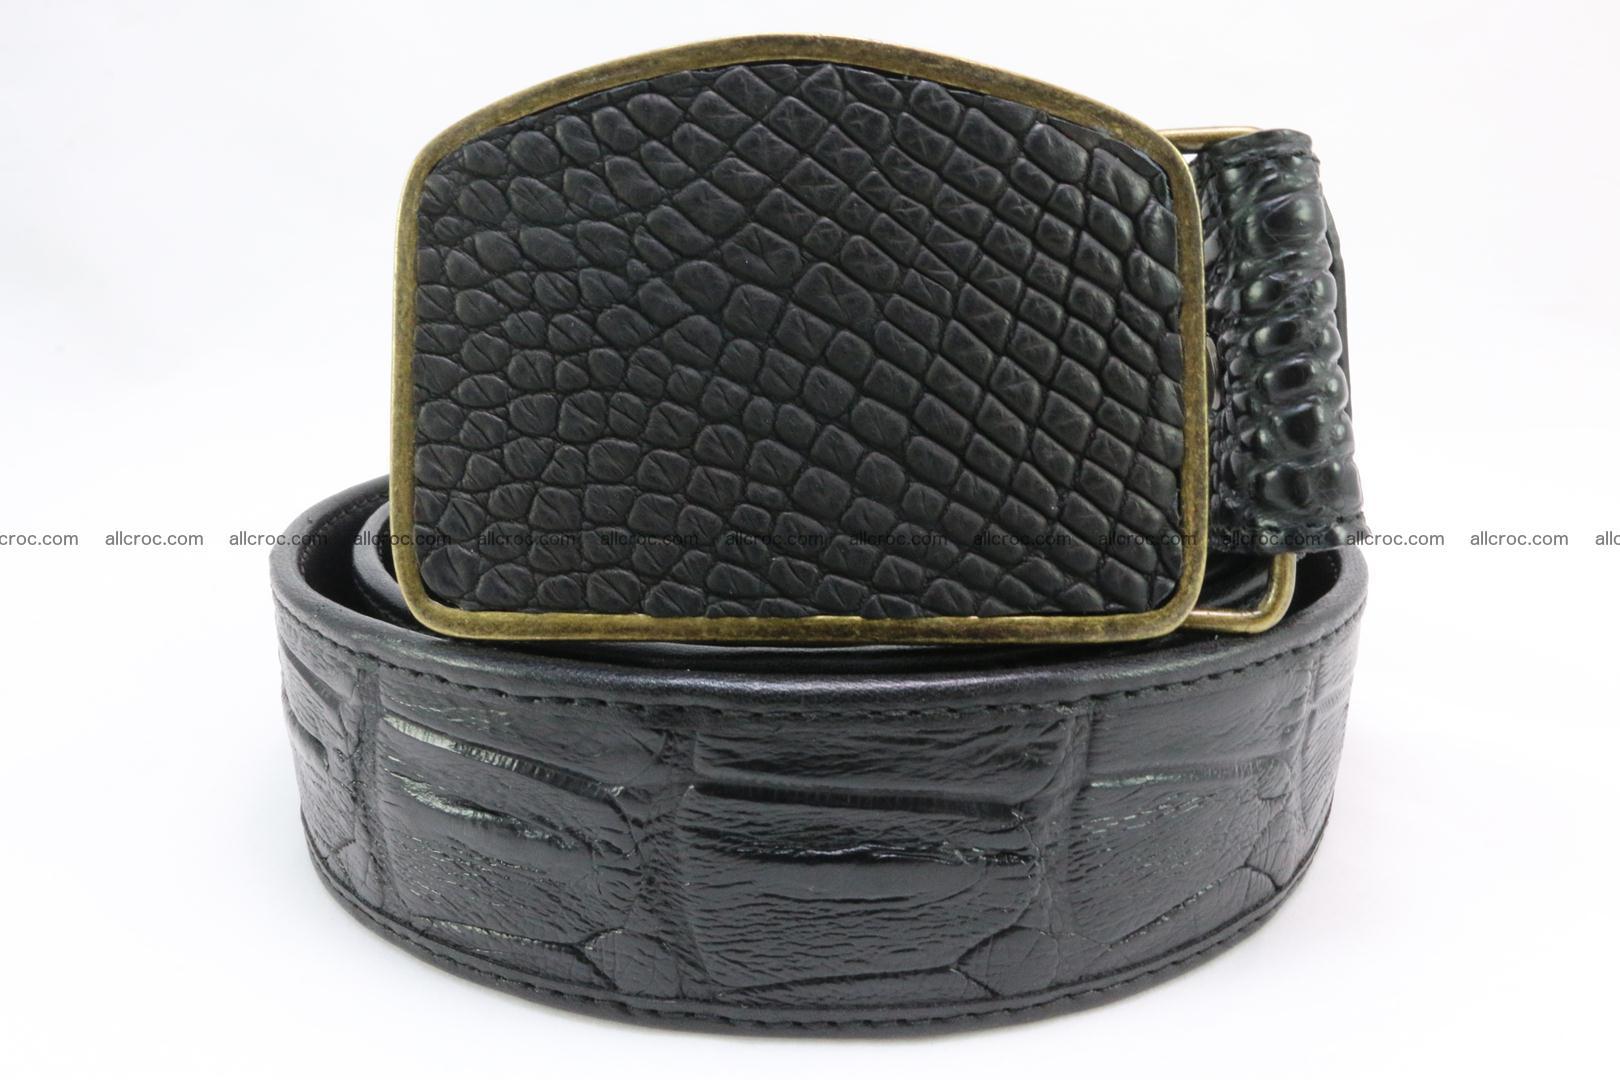 Genuine crocodile leather hornback belt 083 Foto 2